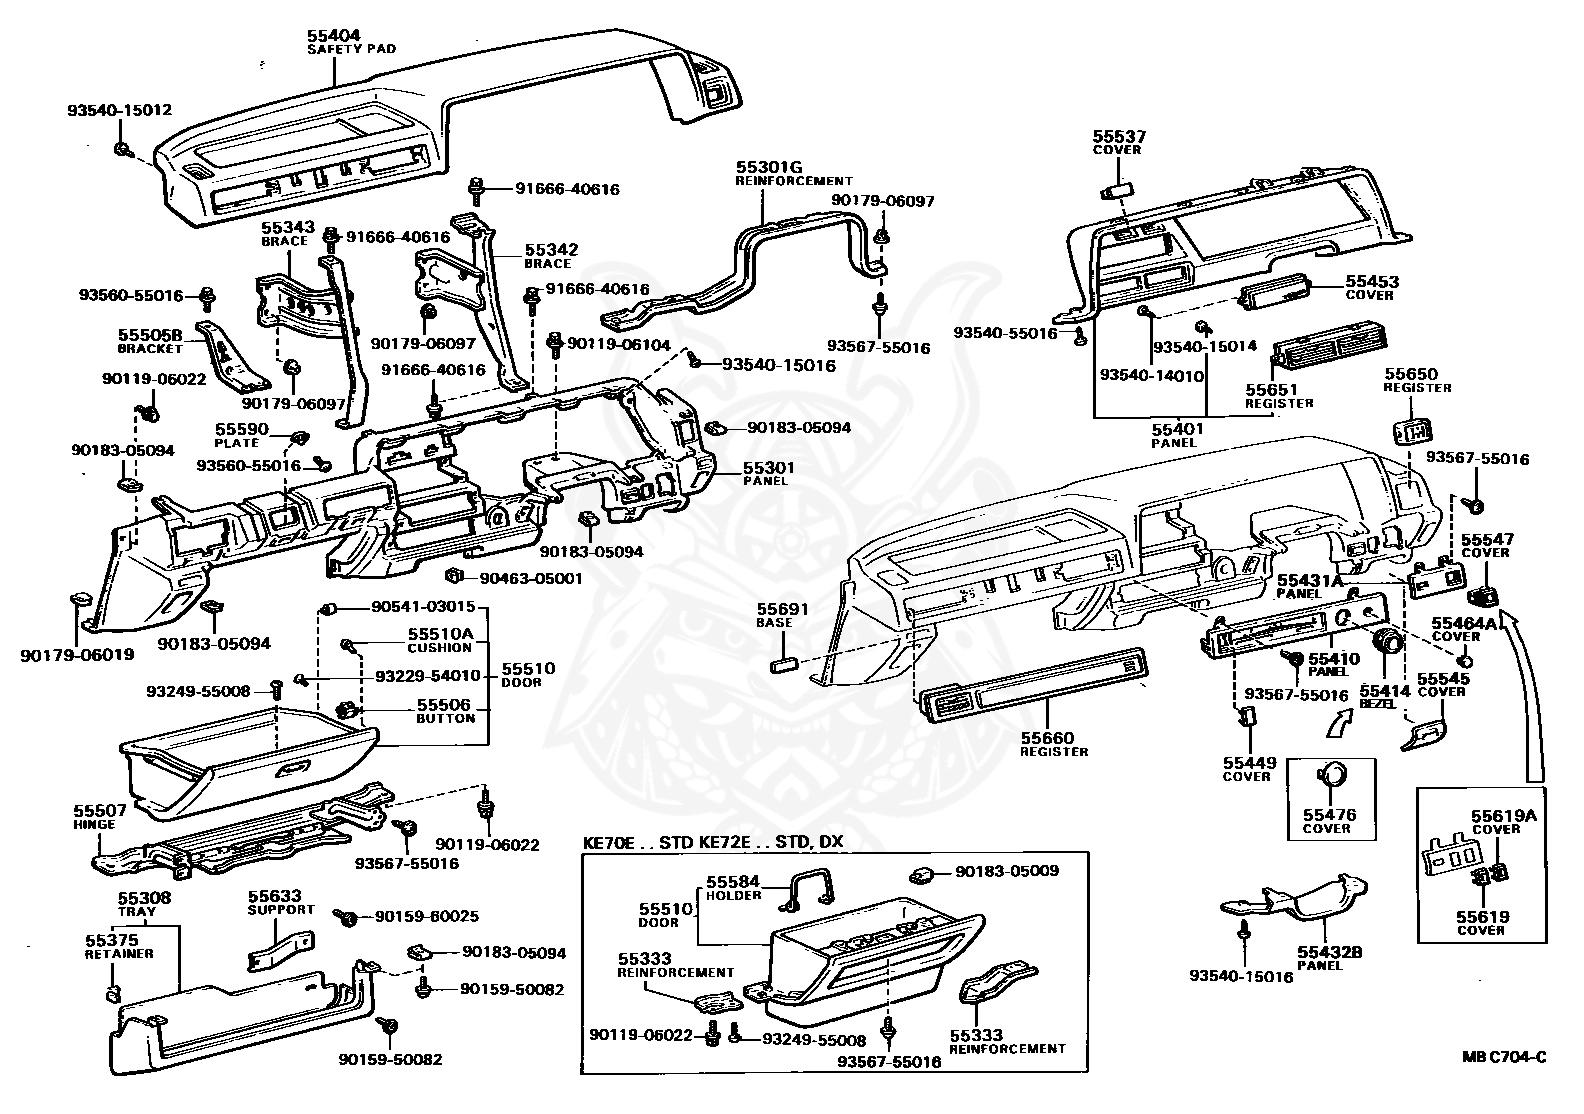 Toyotum Corolla Engine Compartment Diagram